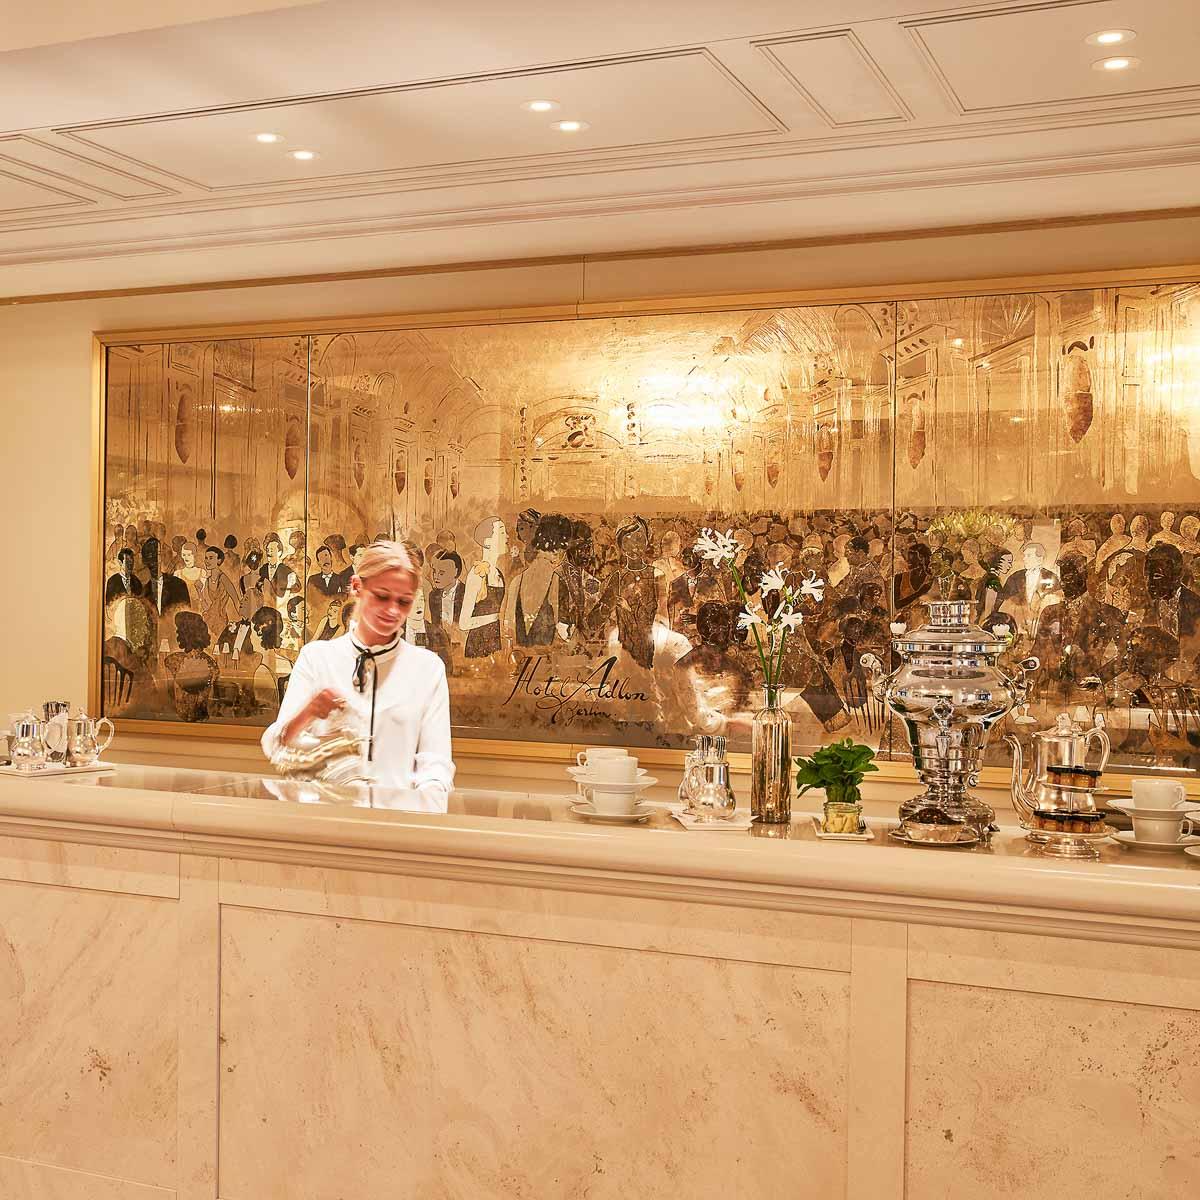 Ballsaal Im Hotel Adlon am Brandenburegr Tor-3